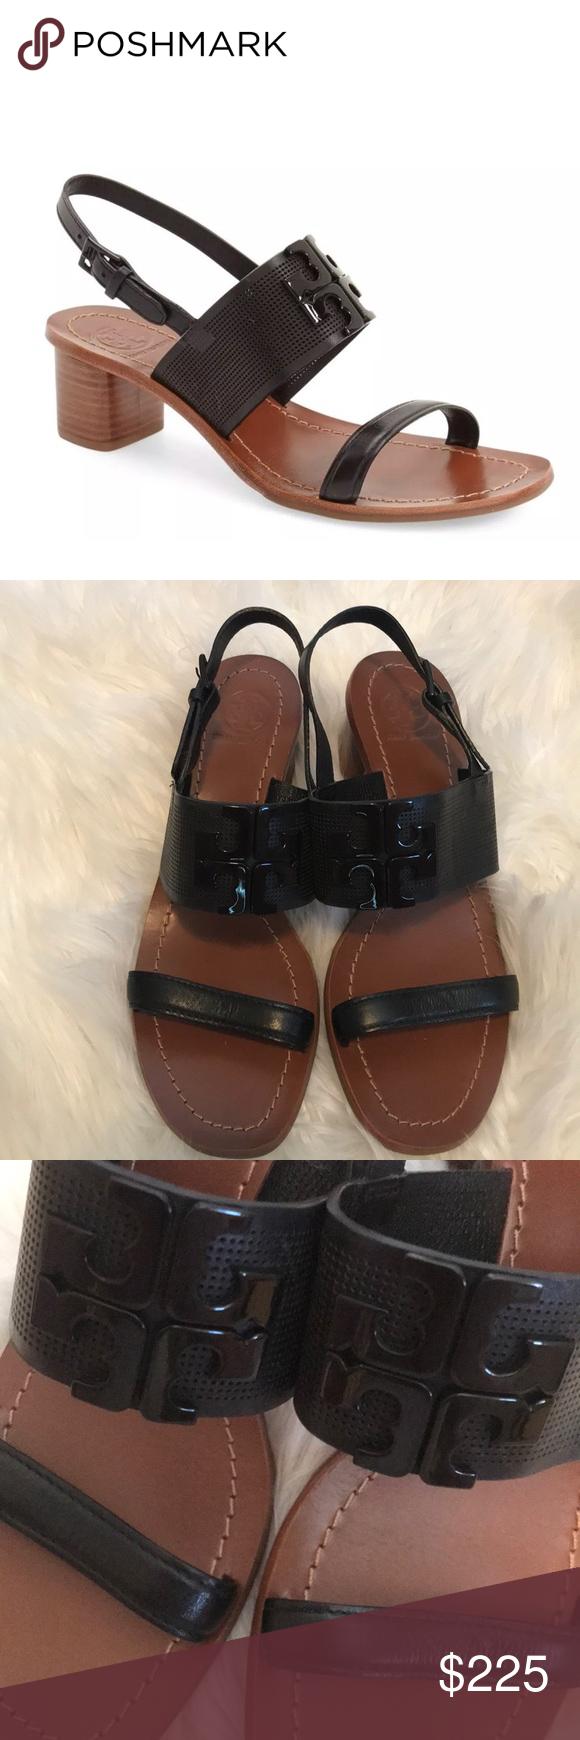 c6095a3964909d Tory Burch block heel Lowell sandal Brand new with tags. Tory Burch Lowell  block heel